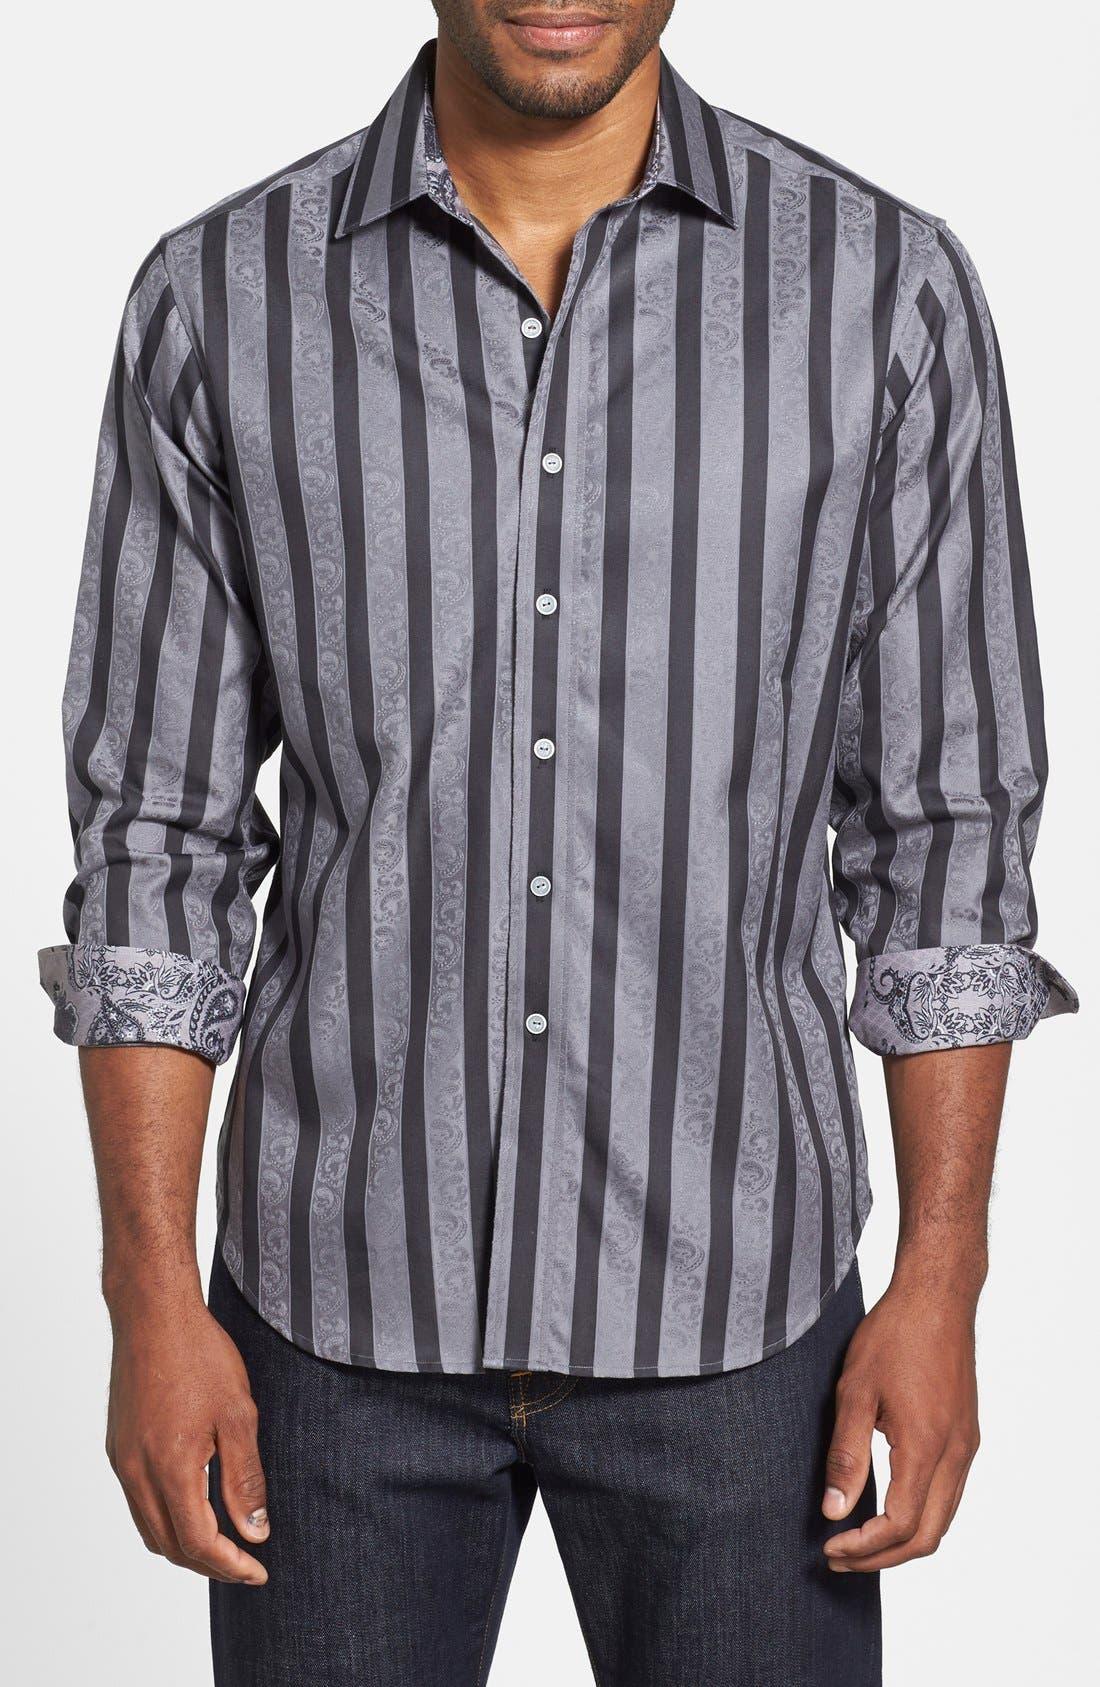 Alternate Image 1 Selected - Robert Graham 'Shawn' Classic Fit Paisley Jacquard Sport Shirt